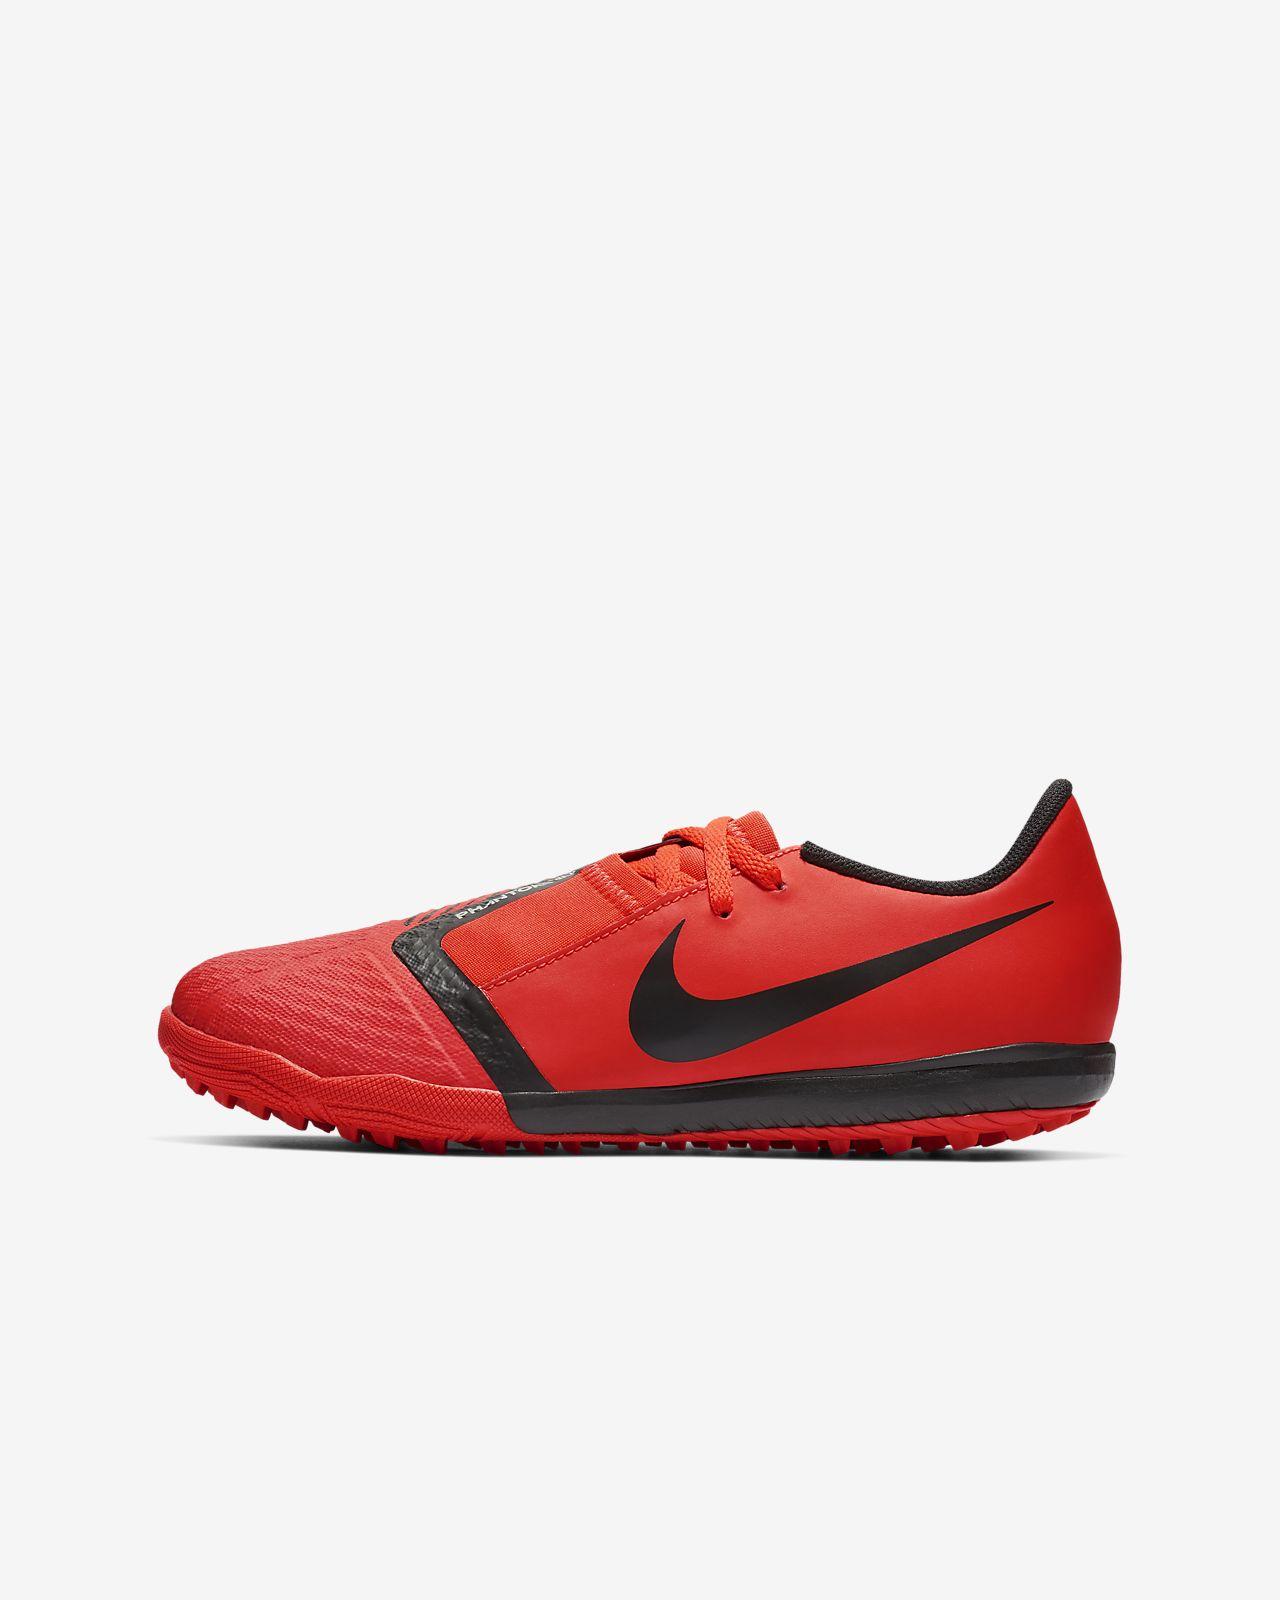 05b4c0483ad84 ... Nike Jr. Phantom Venom Academy TF Botas de fútbol para moqueta - Turf -  Niño